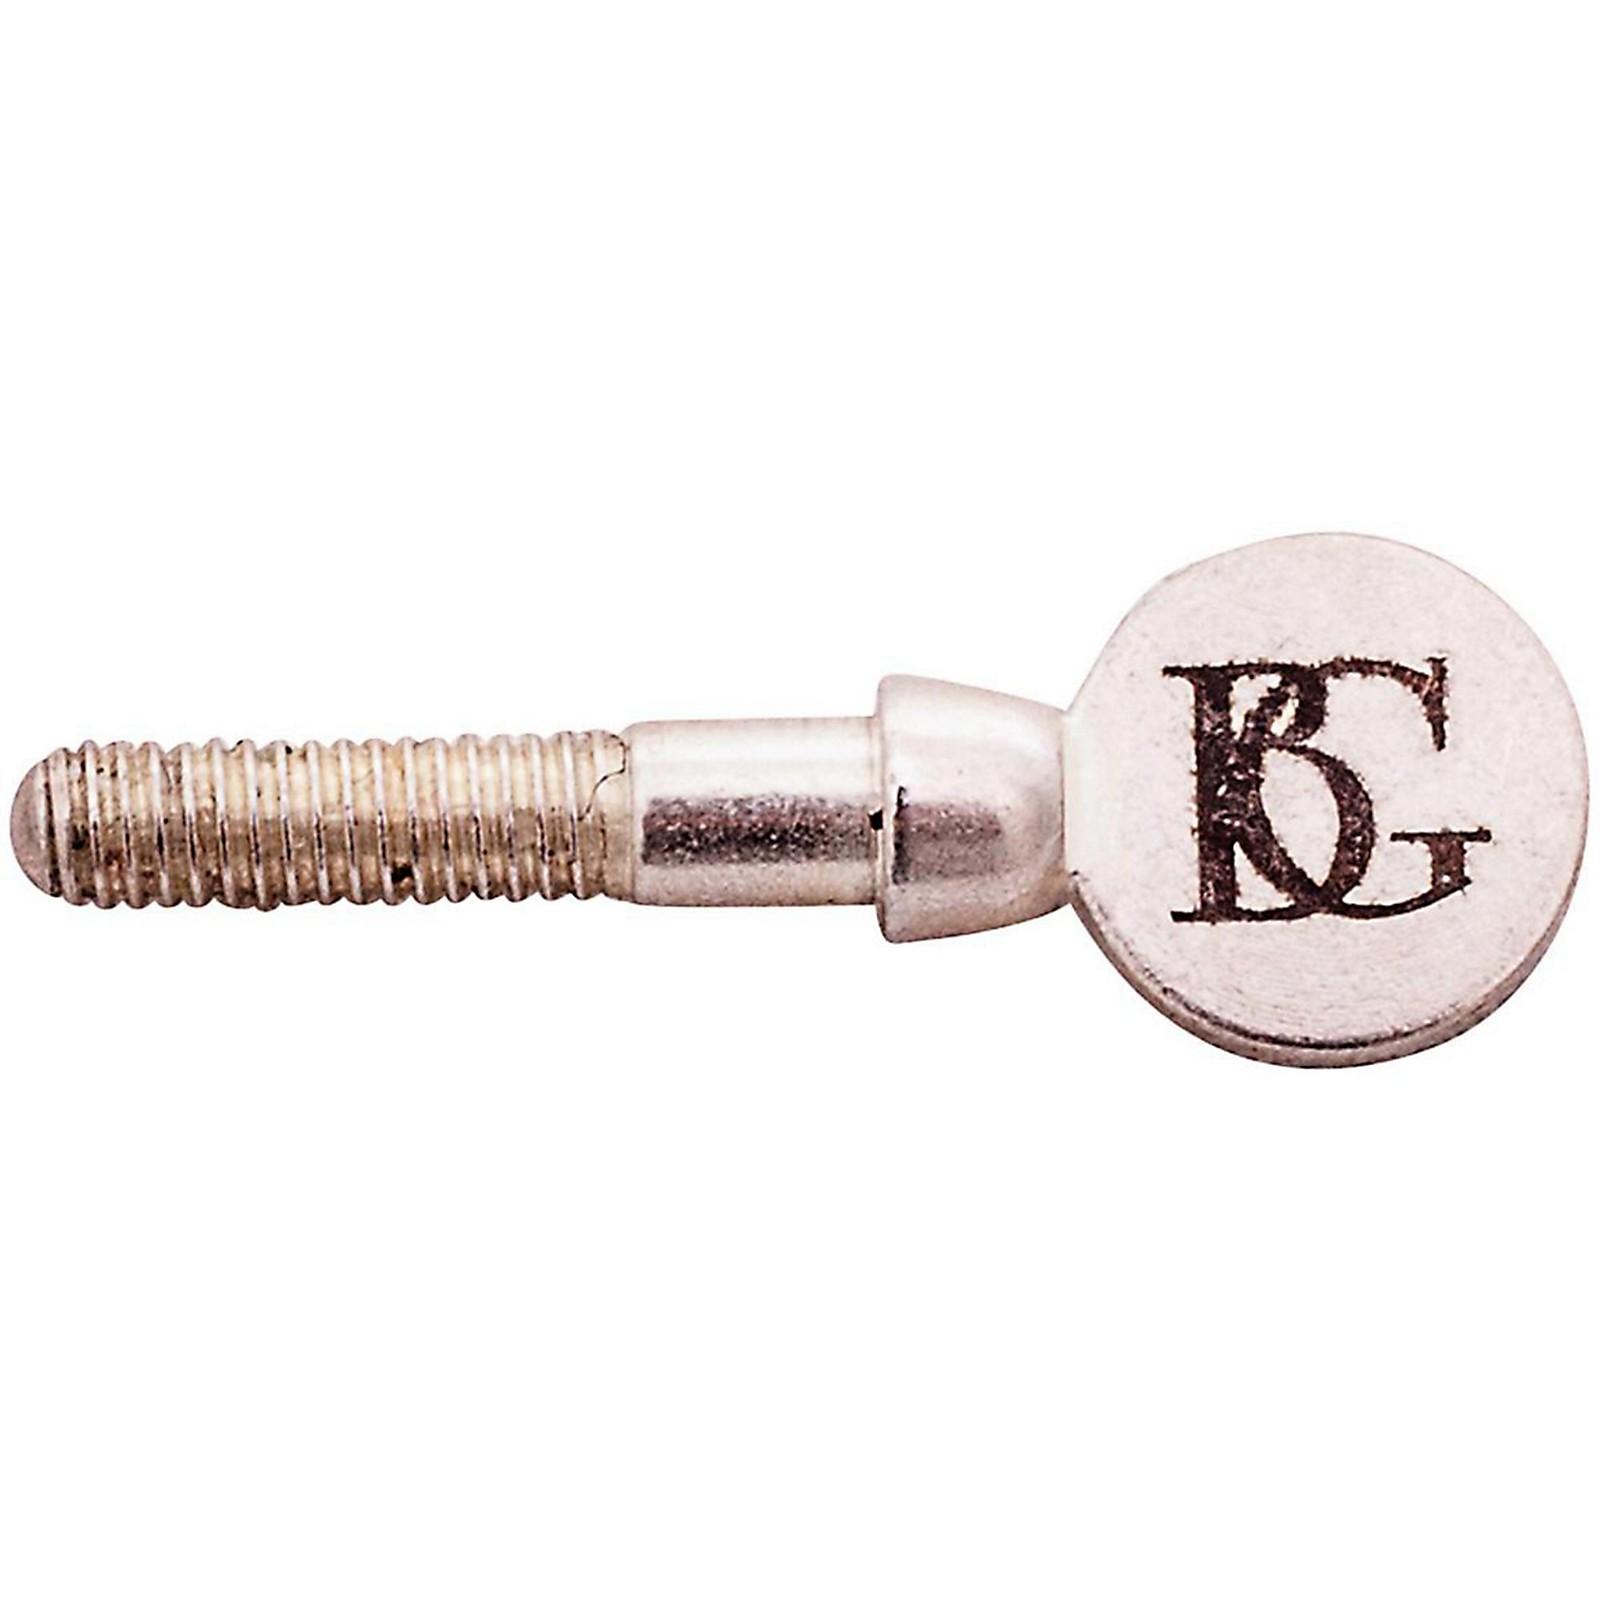 BG Silver-Plated Spare Ligature Screw